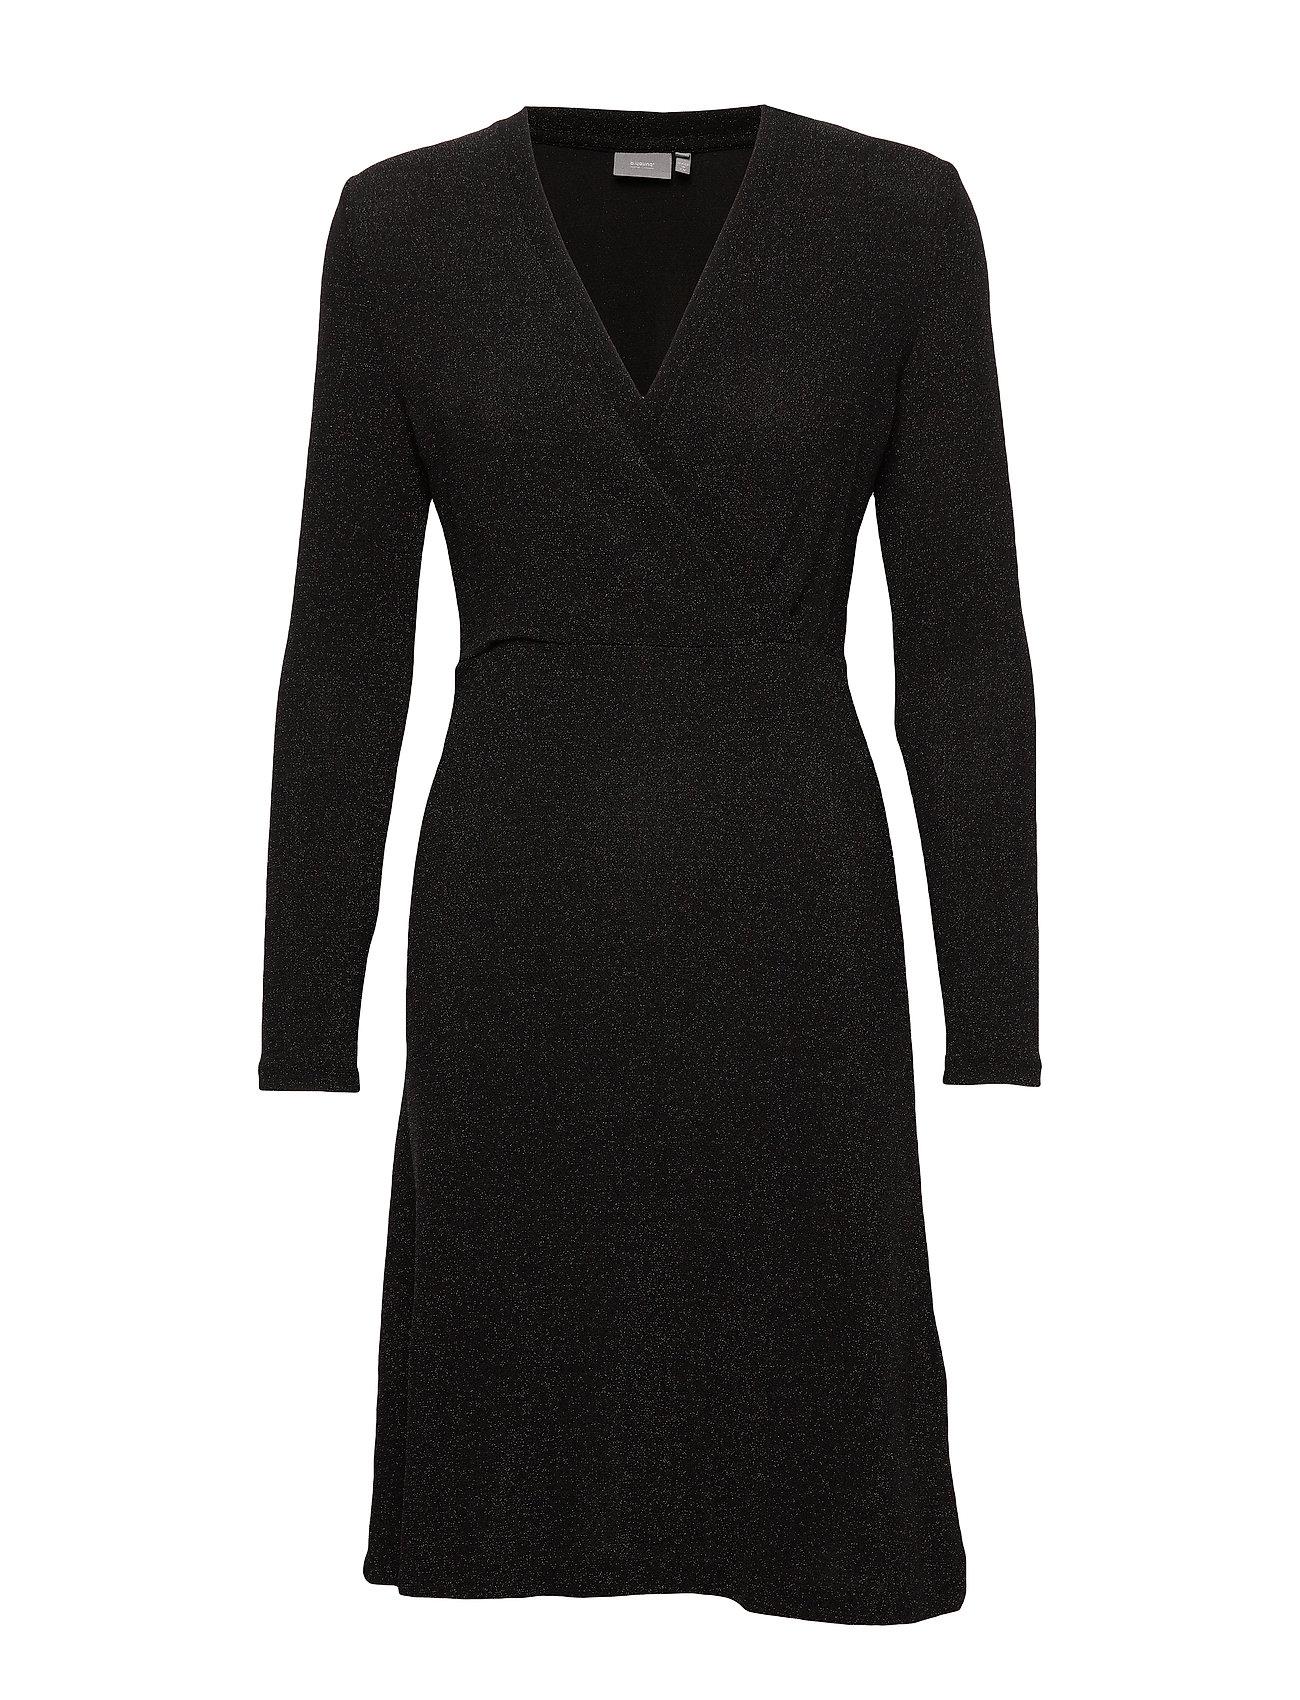 b.young BYSELBY DRESS - - BLACK GLITTER